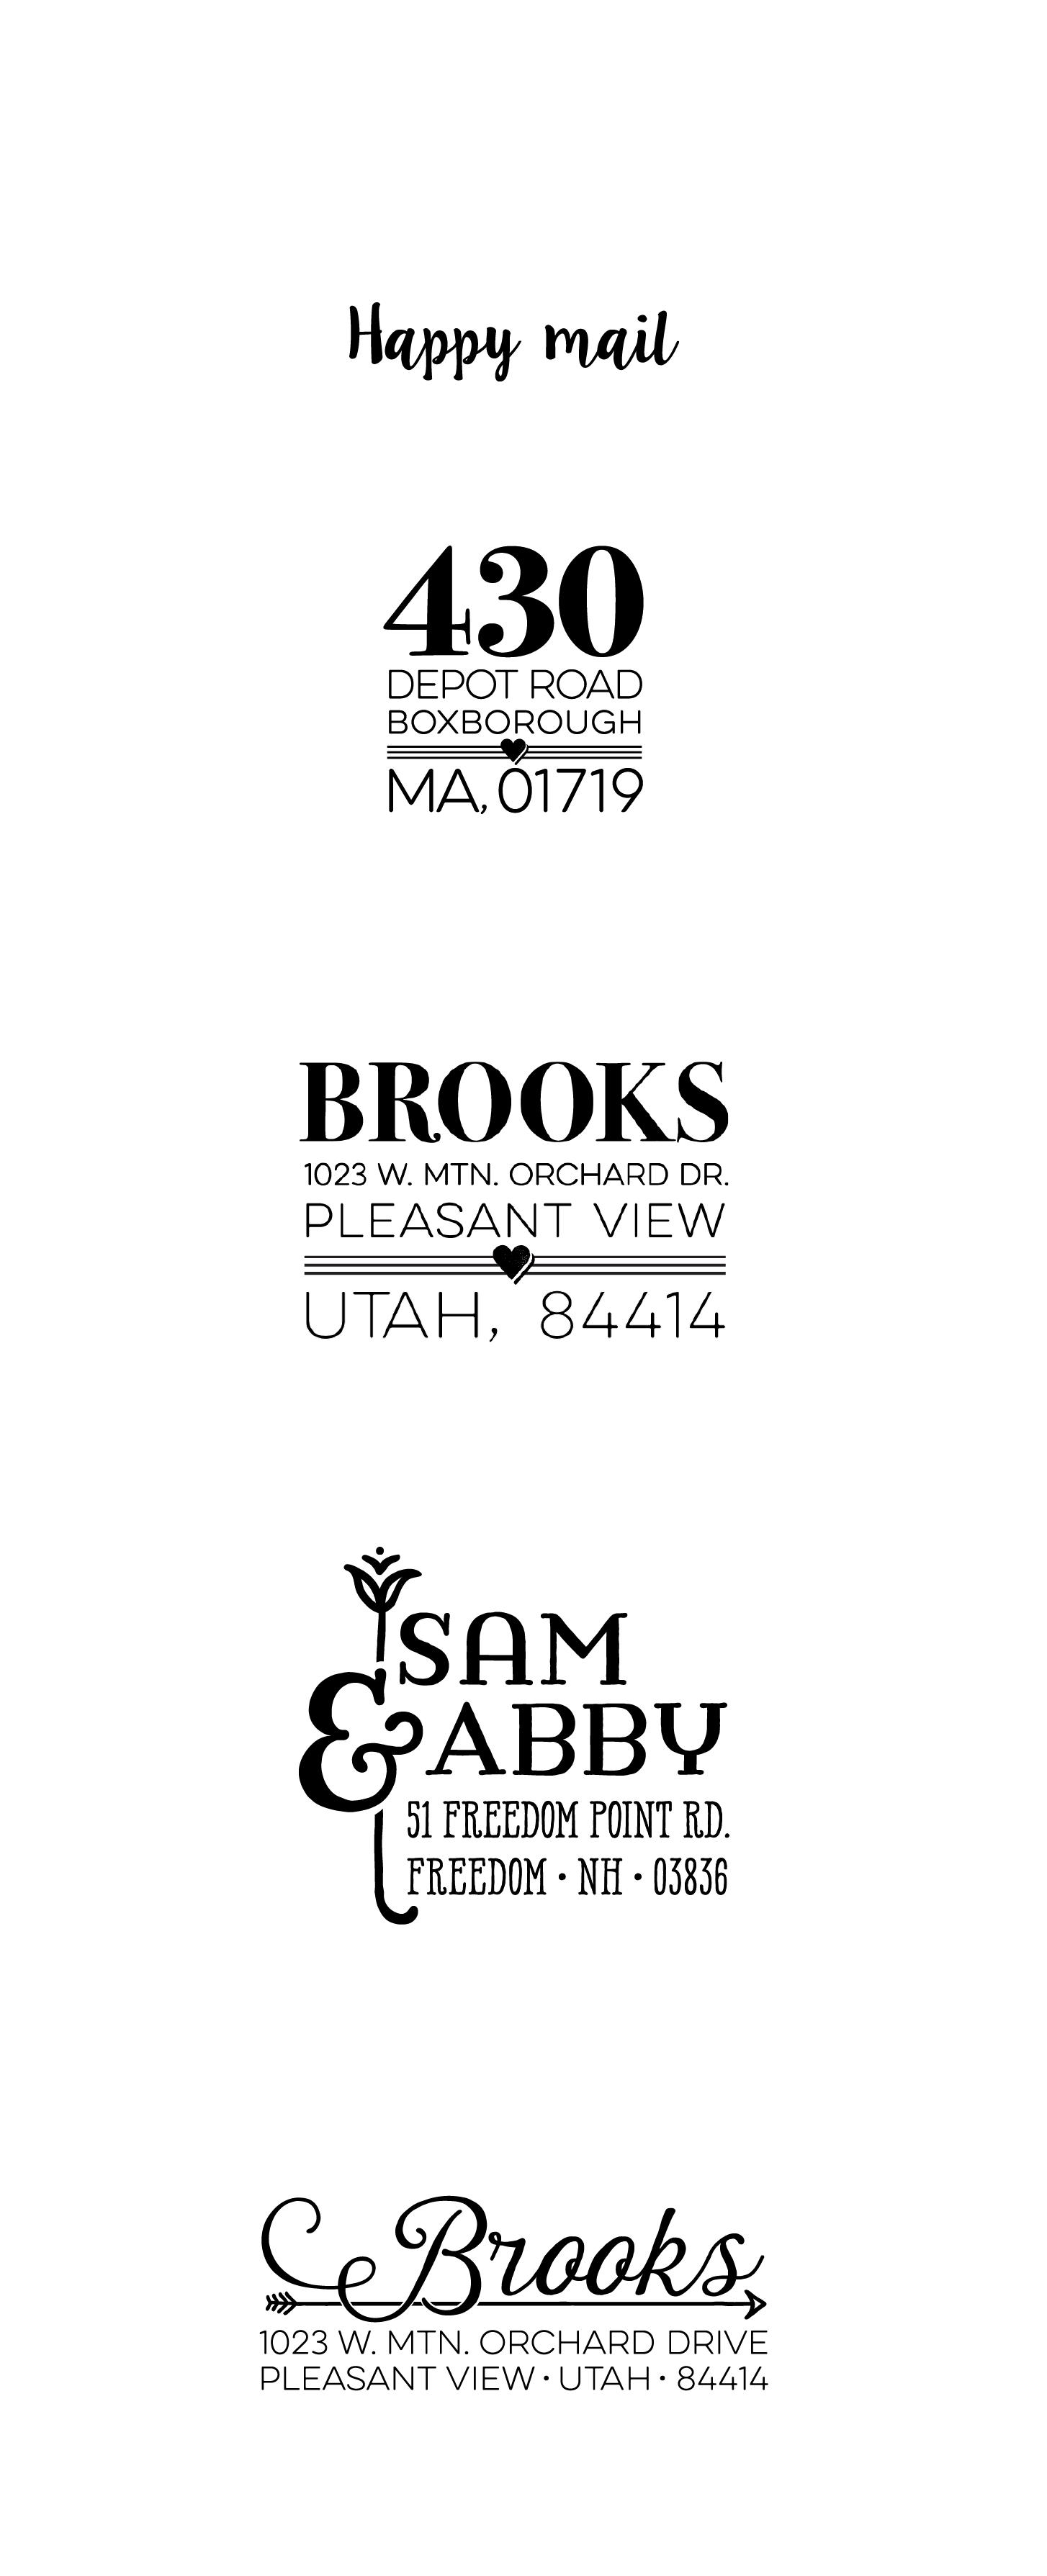 Address stamp designs